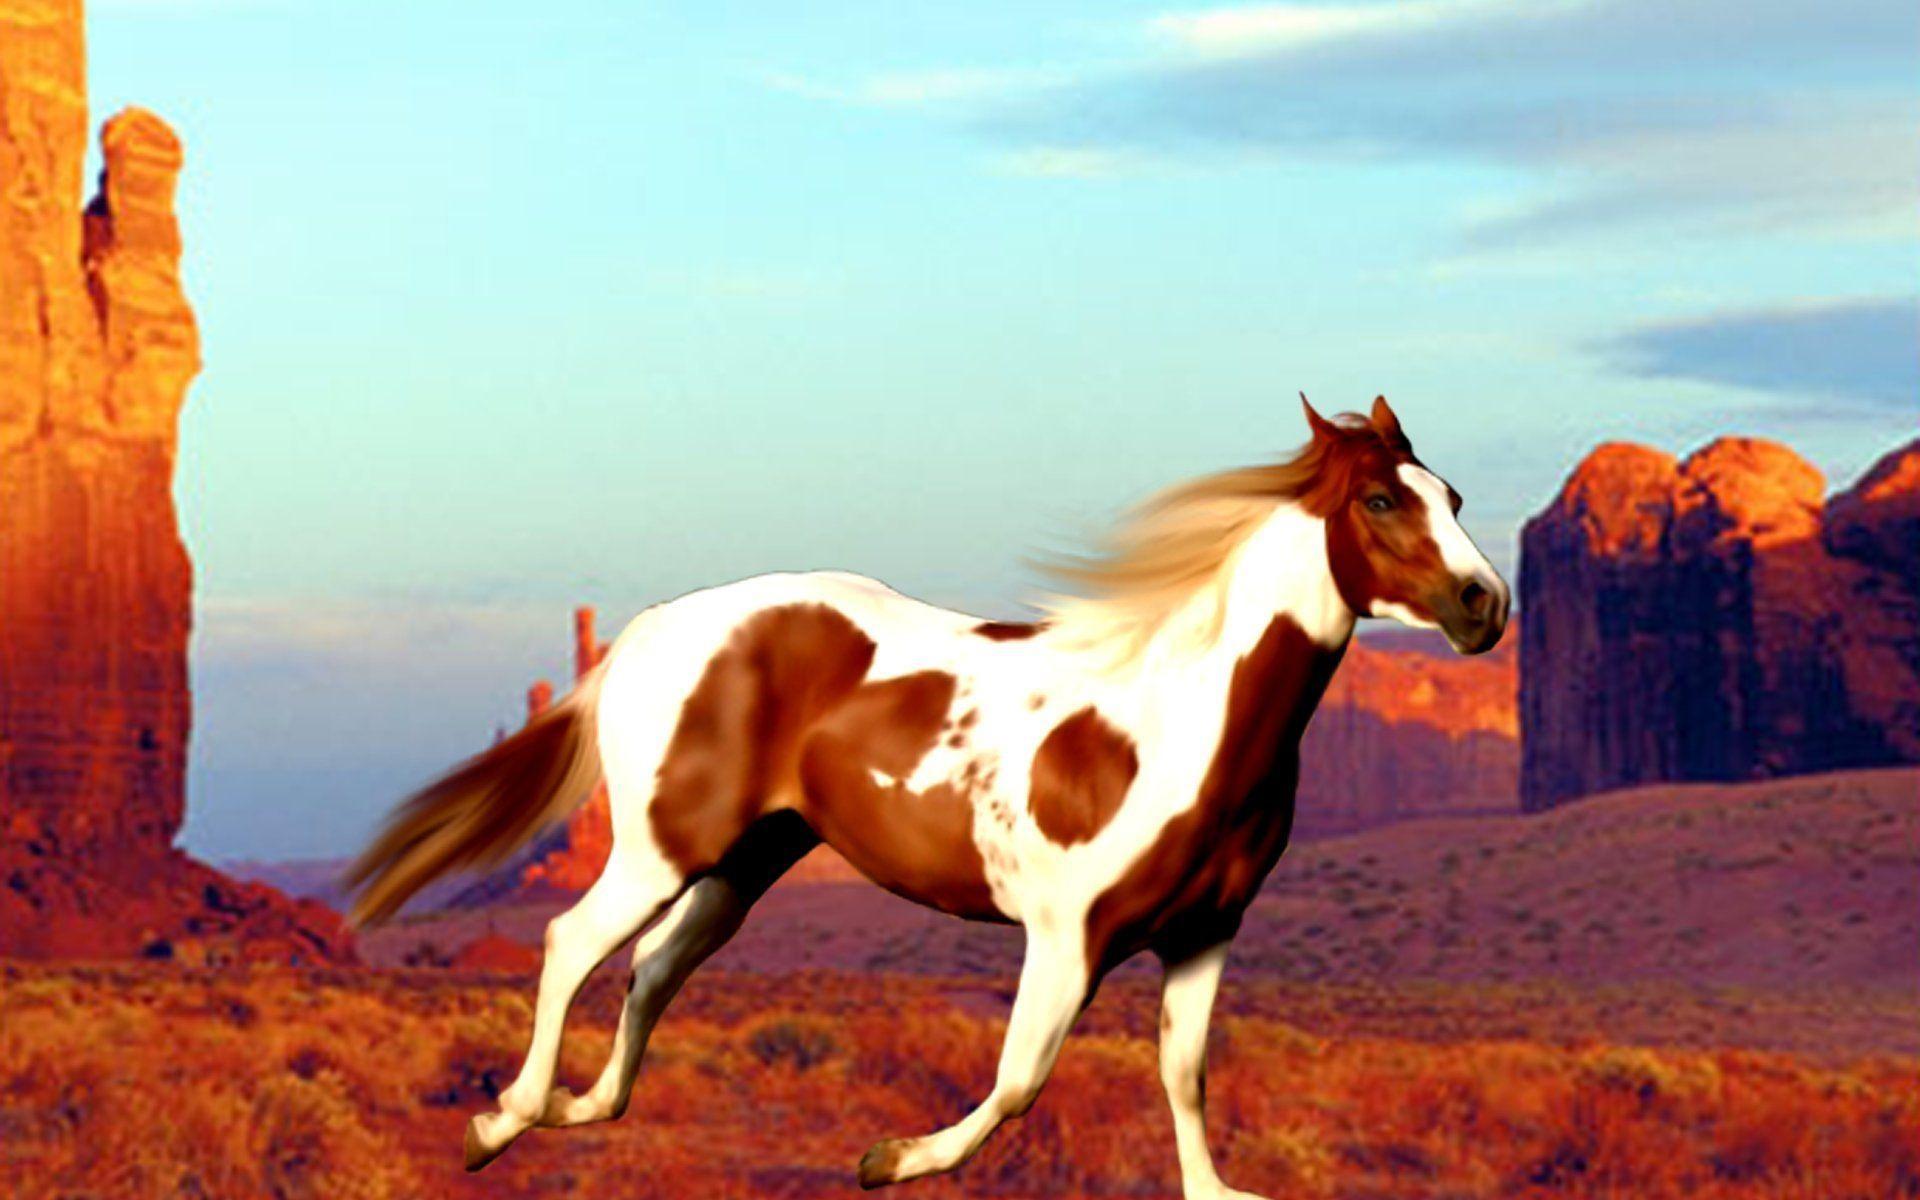 Pretty Western Wallpaper Unique Western Horse Wallpaper For Mac